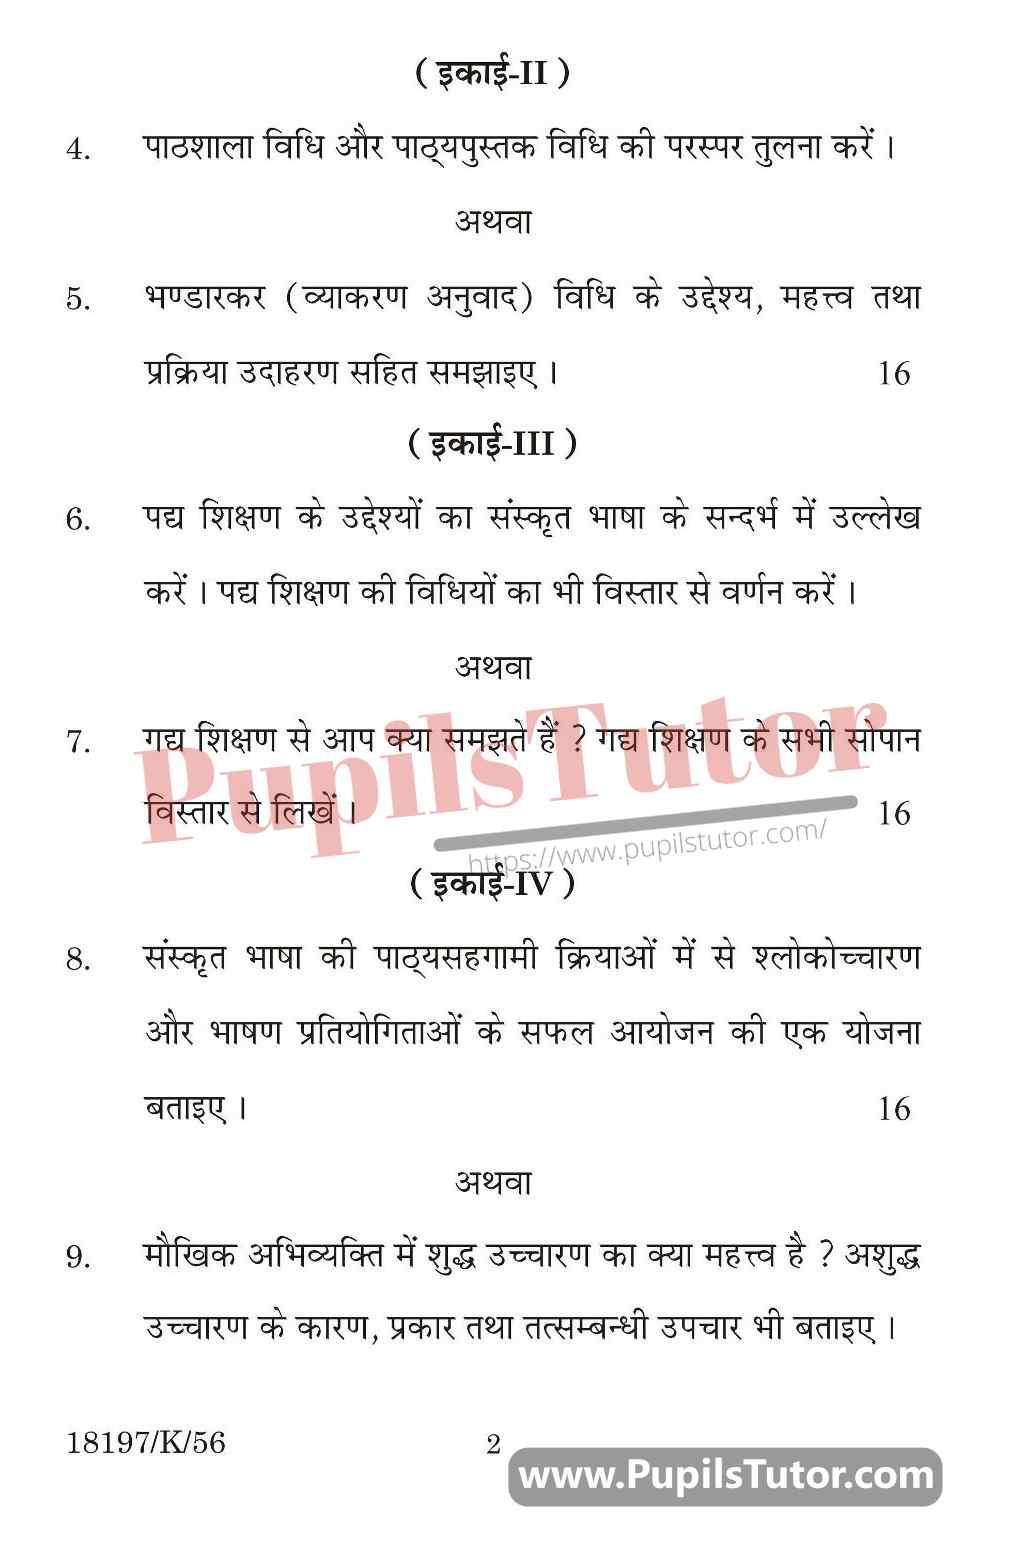 KUK (Kurukshetra University, Haryana) Pedagogy Of Sanskrit Shikshan Question Paper 2020 For B.Ed 1st And 2nd Year And All The 4 Semesters Free Download PDF - Page 2 - www.pupilstutor.com